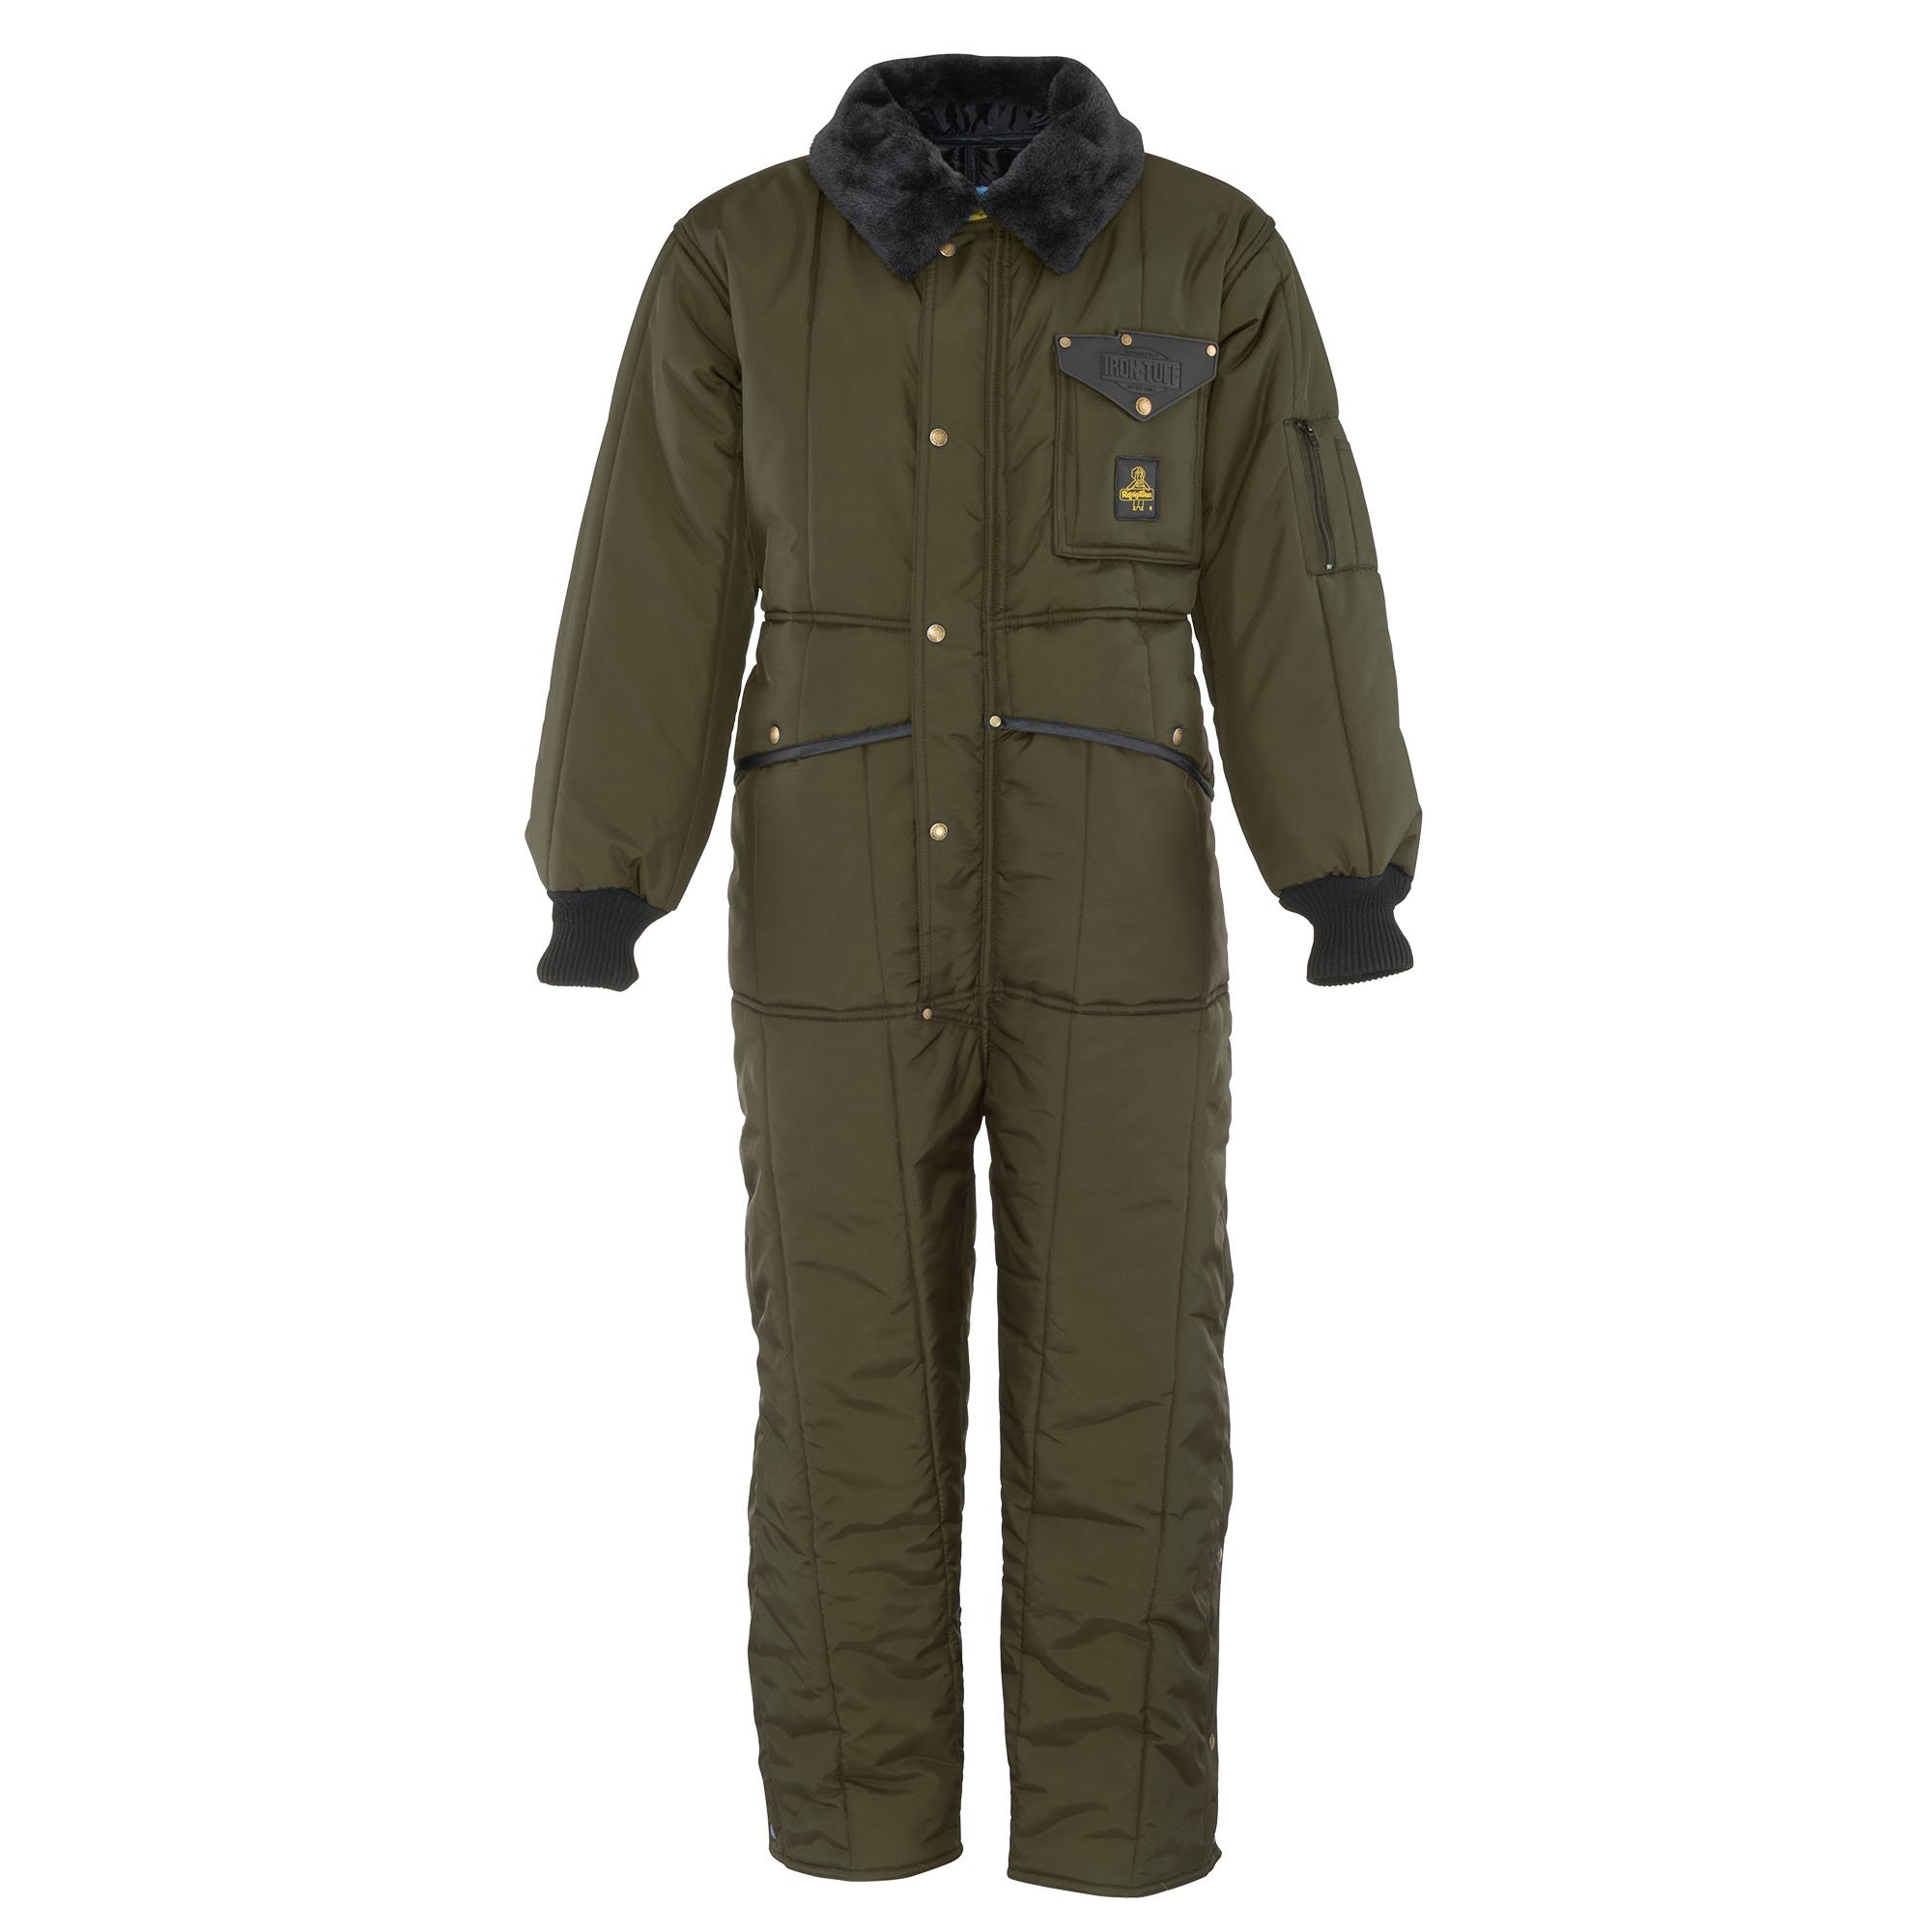 RefrigiWear Men's Iron-Tuff Coveralls Minus 50 Suit (Sage, XL Short)